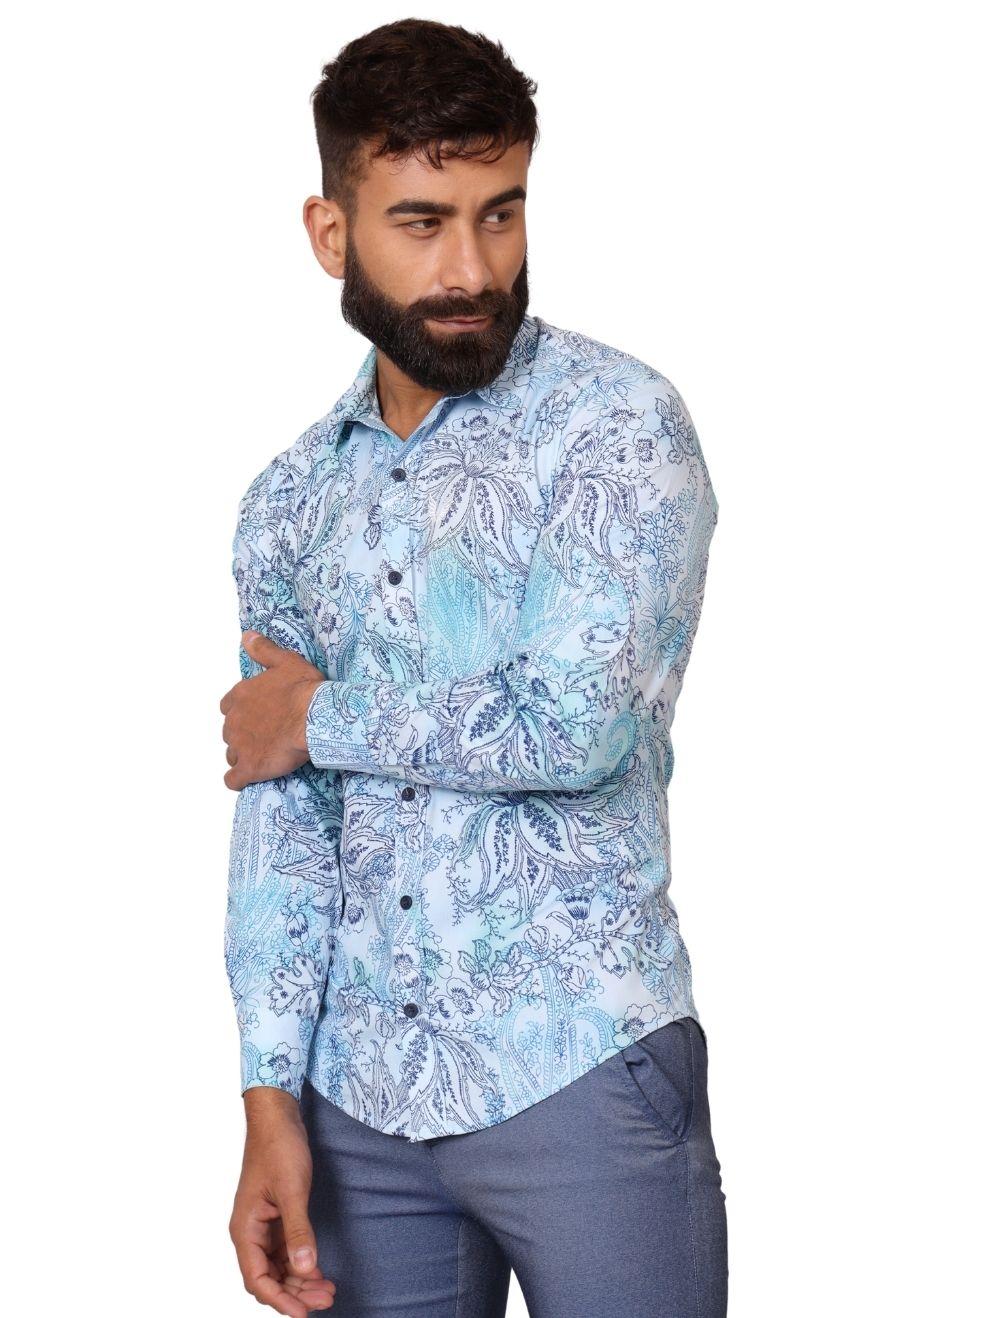 Camisa Masculina Slim Manga Longa com Elastano Arabesco Azul